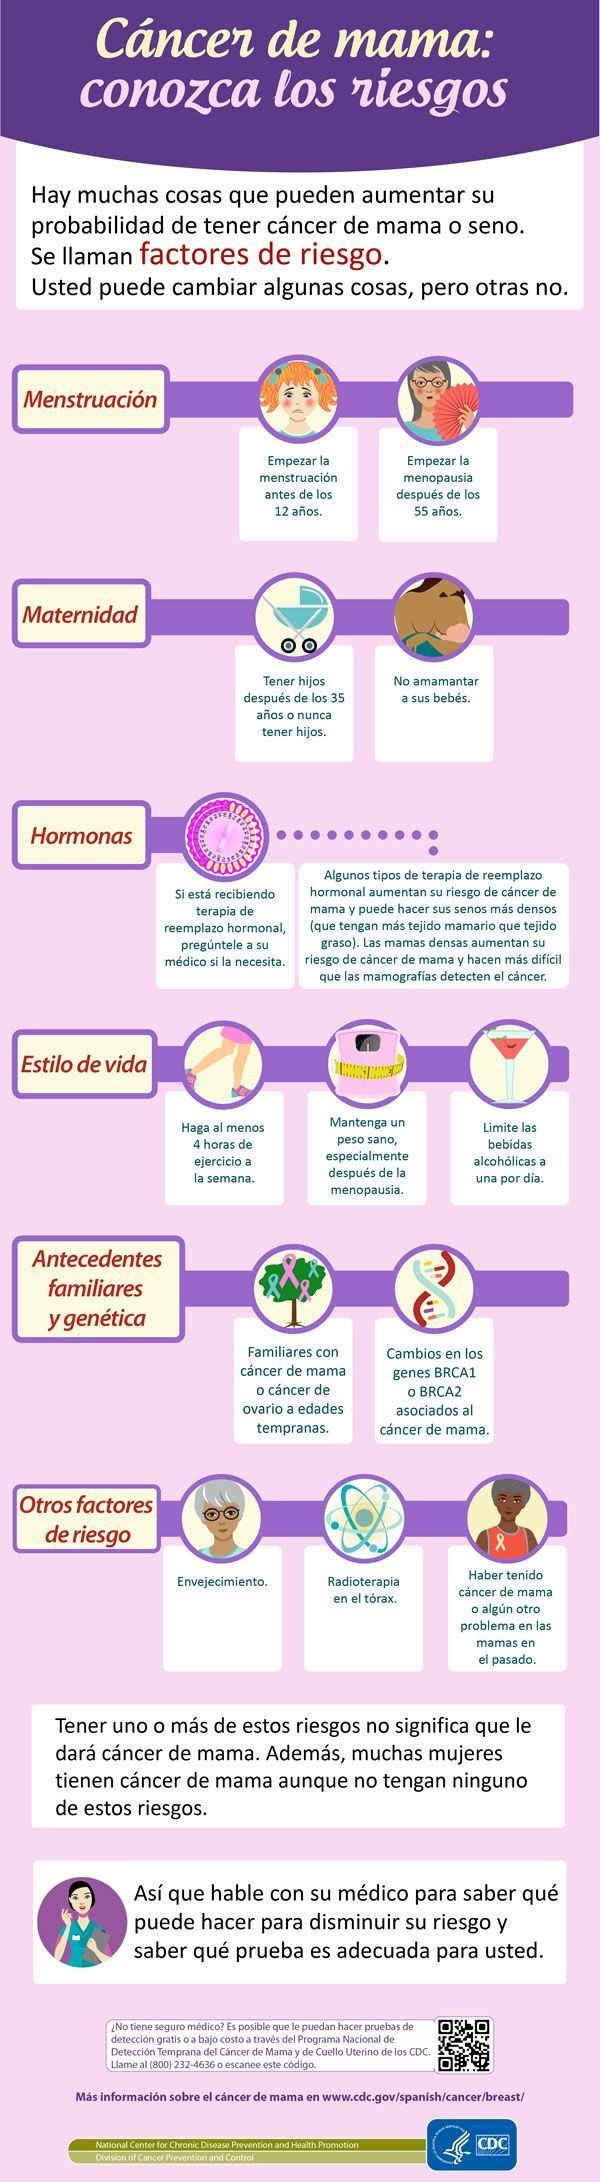 Descubre con esta infografía los factores de riesgo que afectan al cáncer de mama. #salud #cancer #infografia #infogaphic